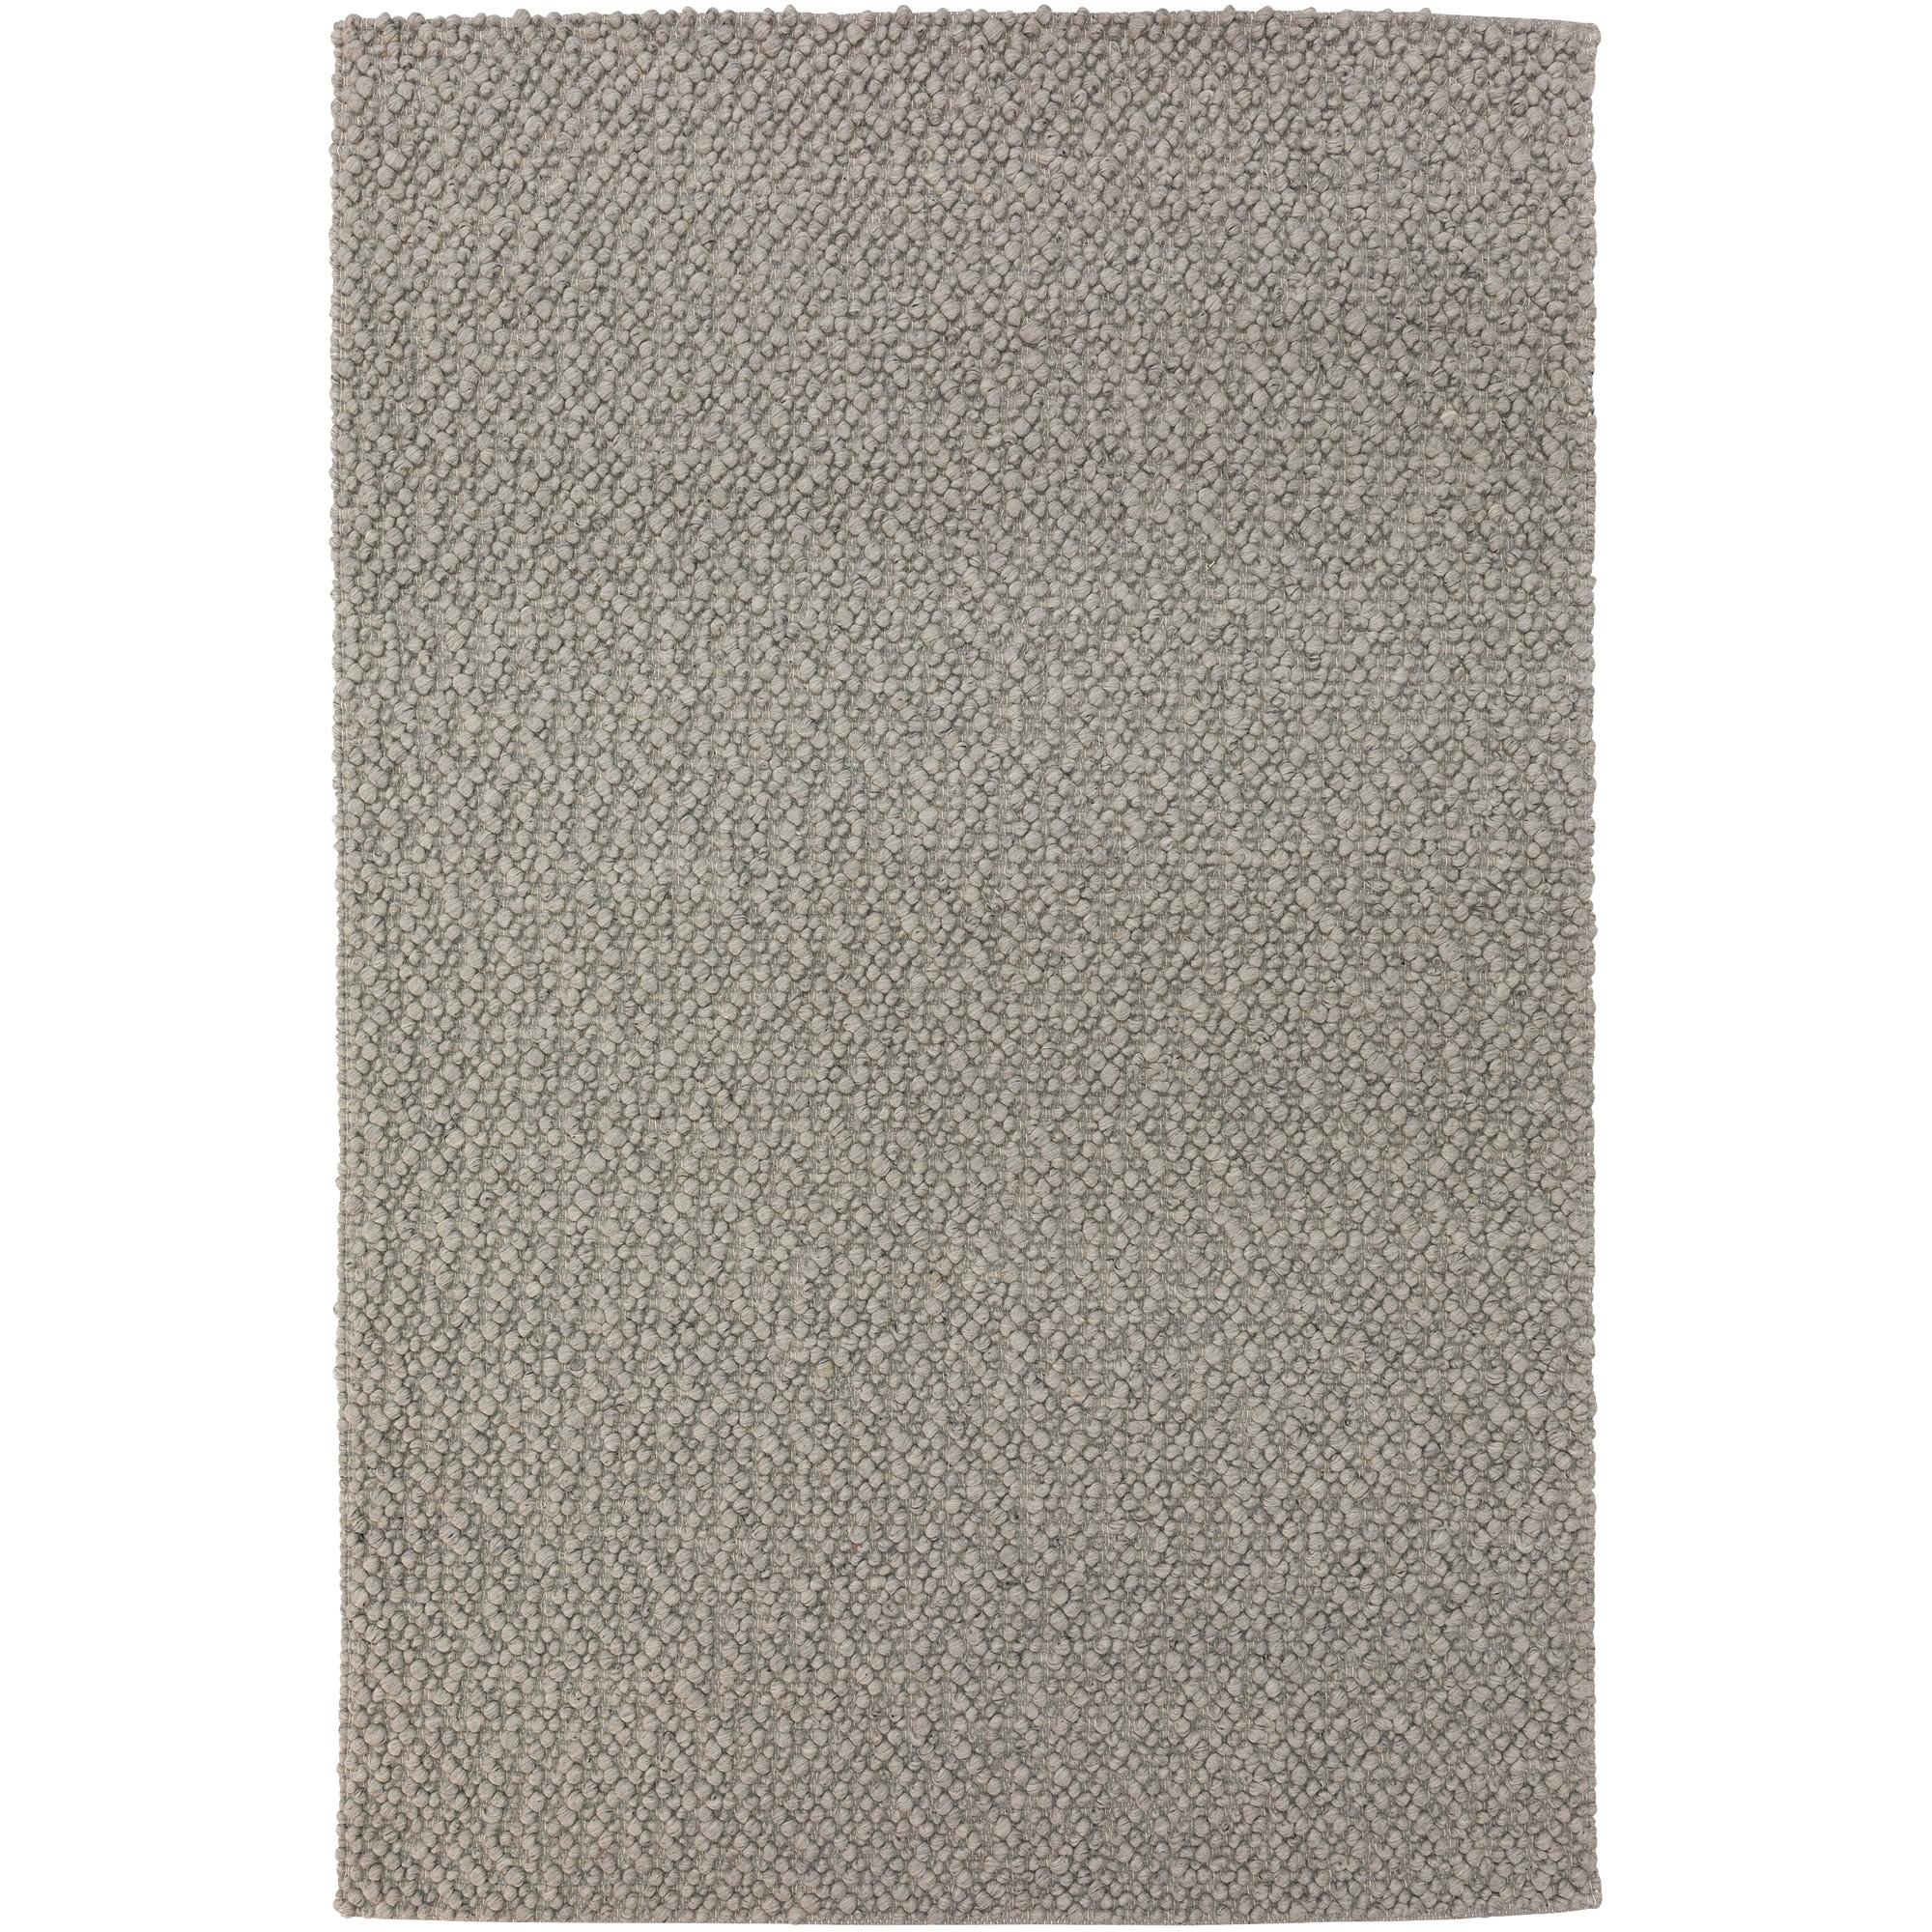 Dalyn Rug Company | Gorbea Silver 8x10 Area Rug